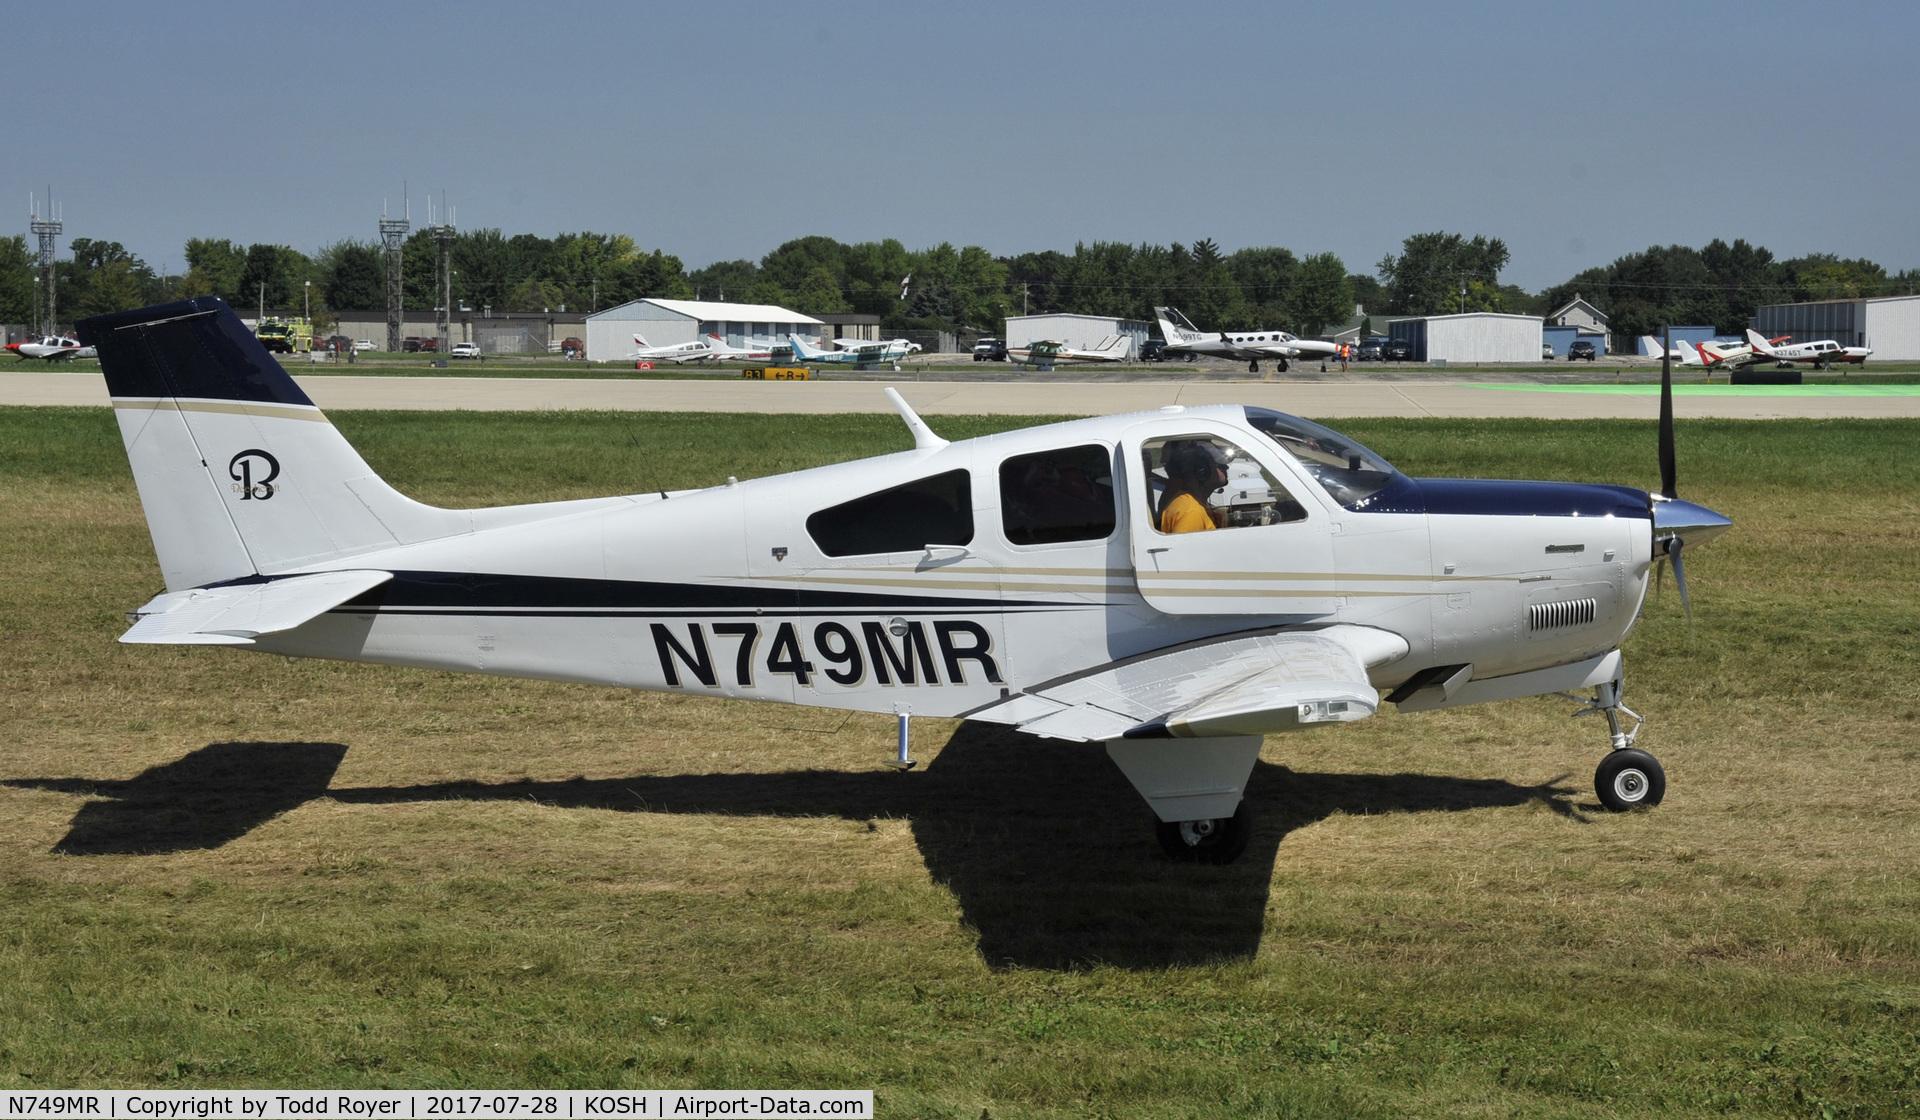 N749MR, 1979 Beech F33A Bonanza C/N CE859, Airventure 2017